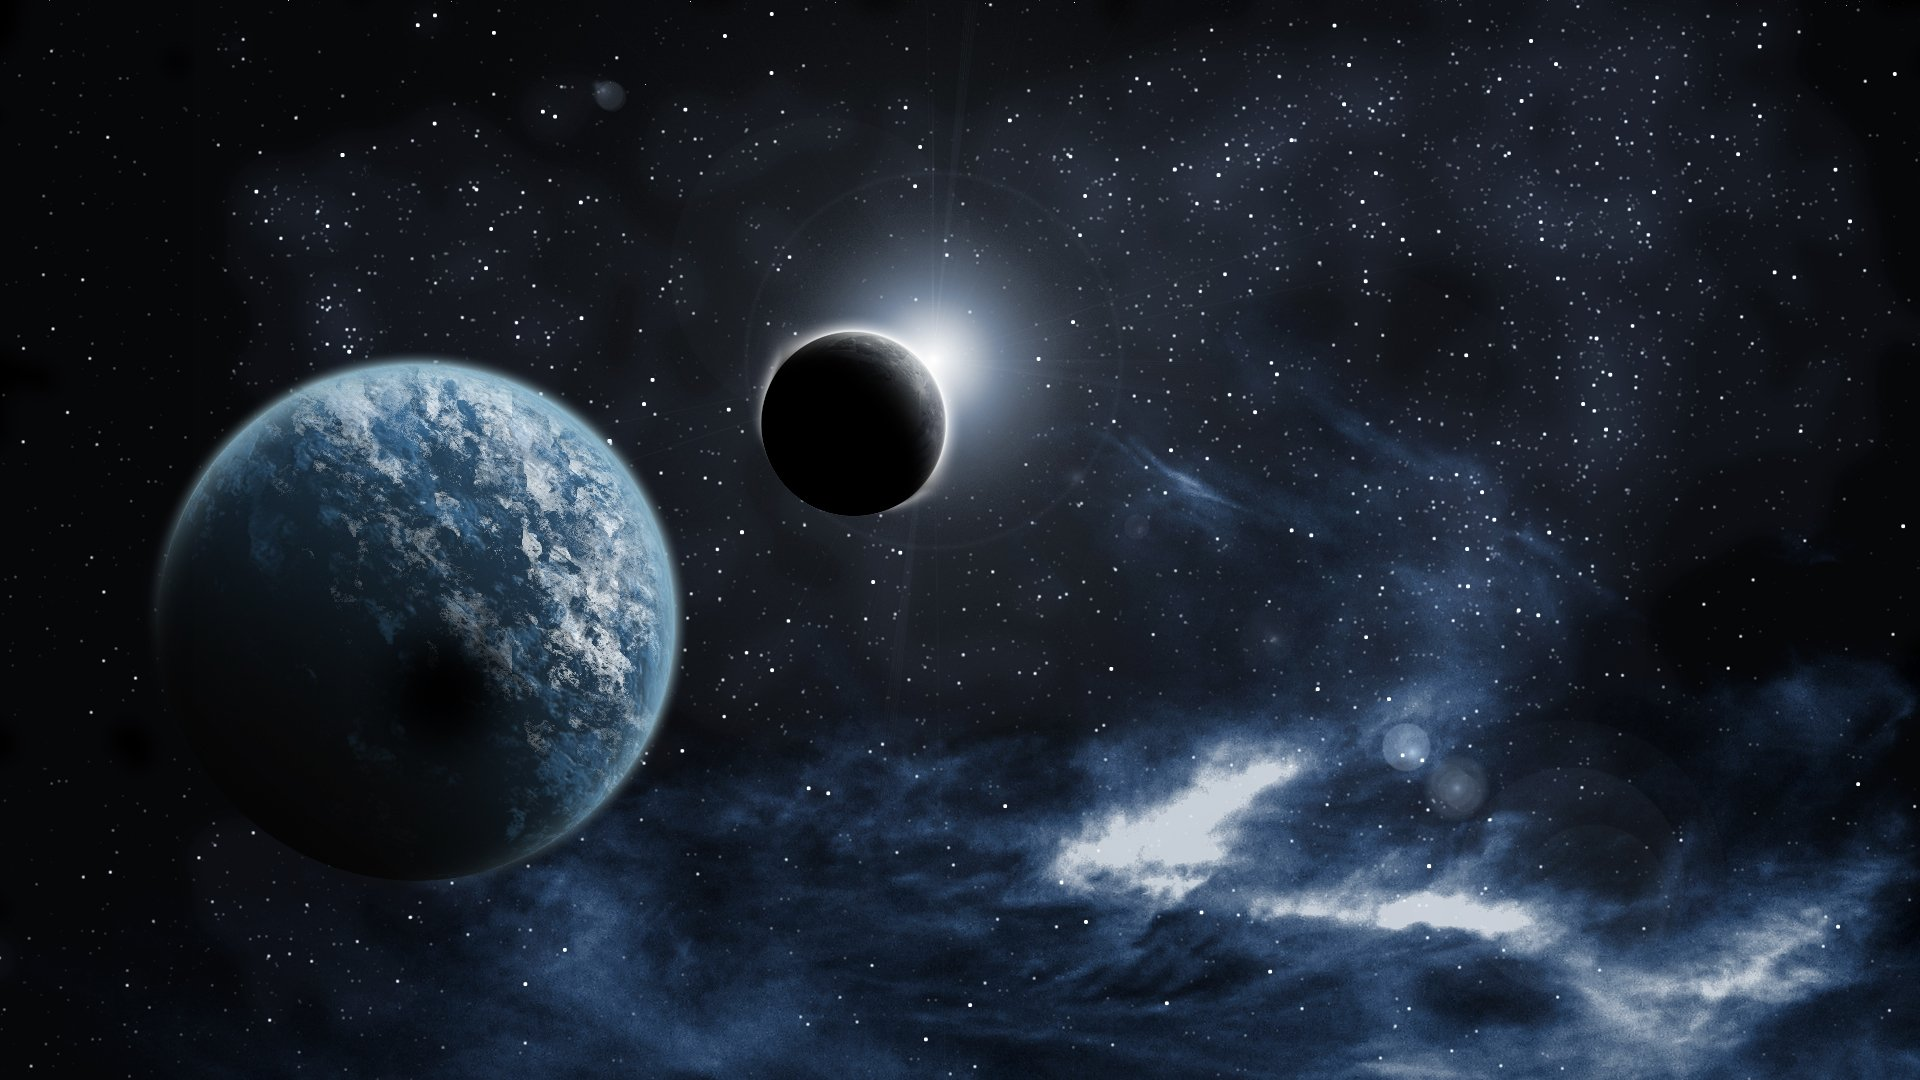 moon Sci Fi Wallpaper Background 39513 1920x1080